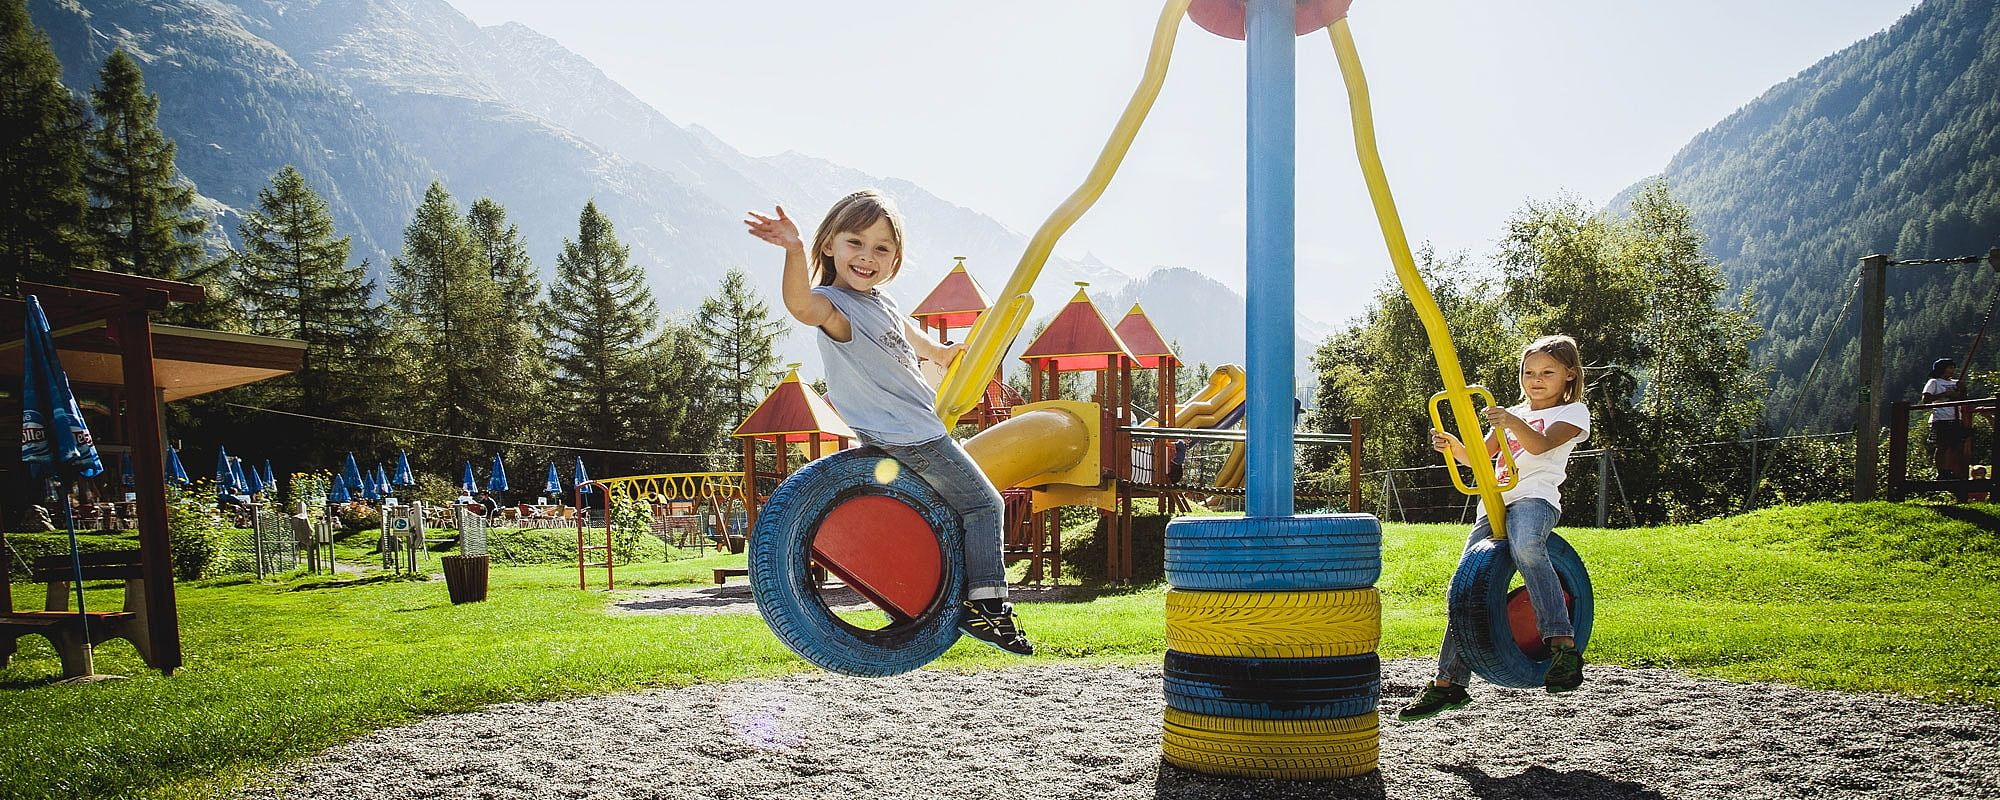 Erlebnis-Funpark in Huben